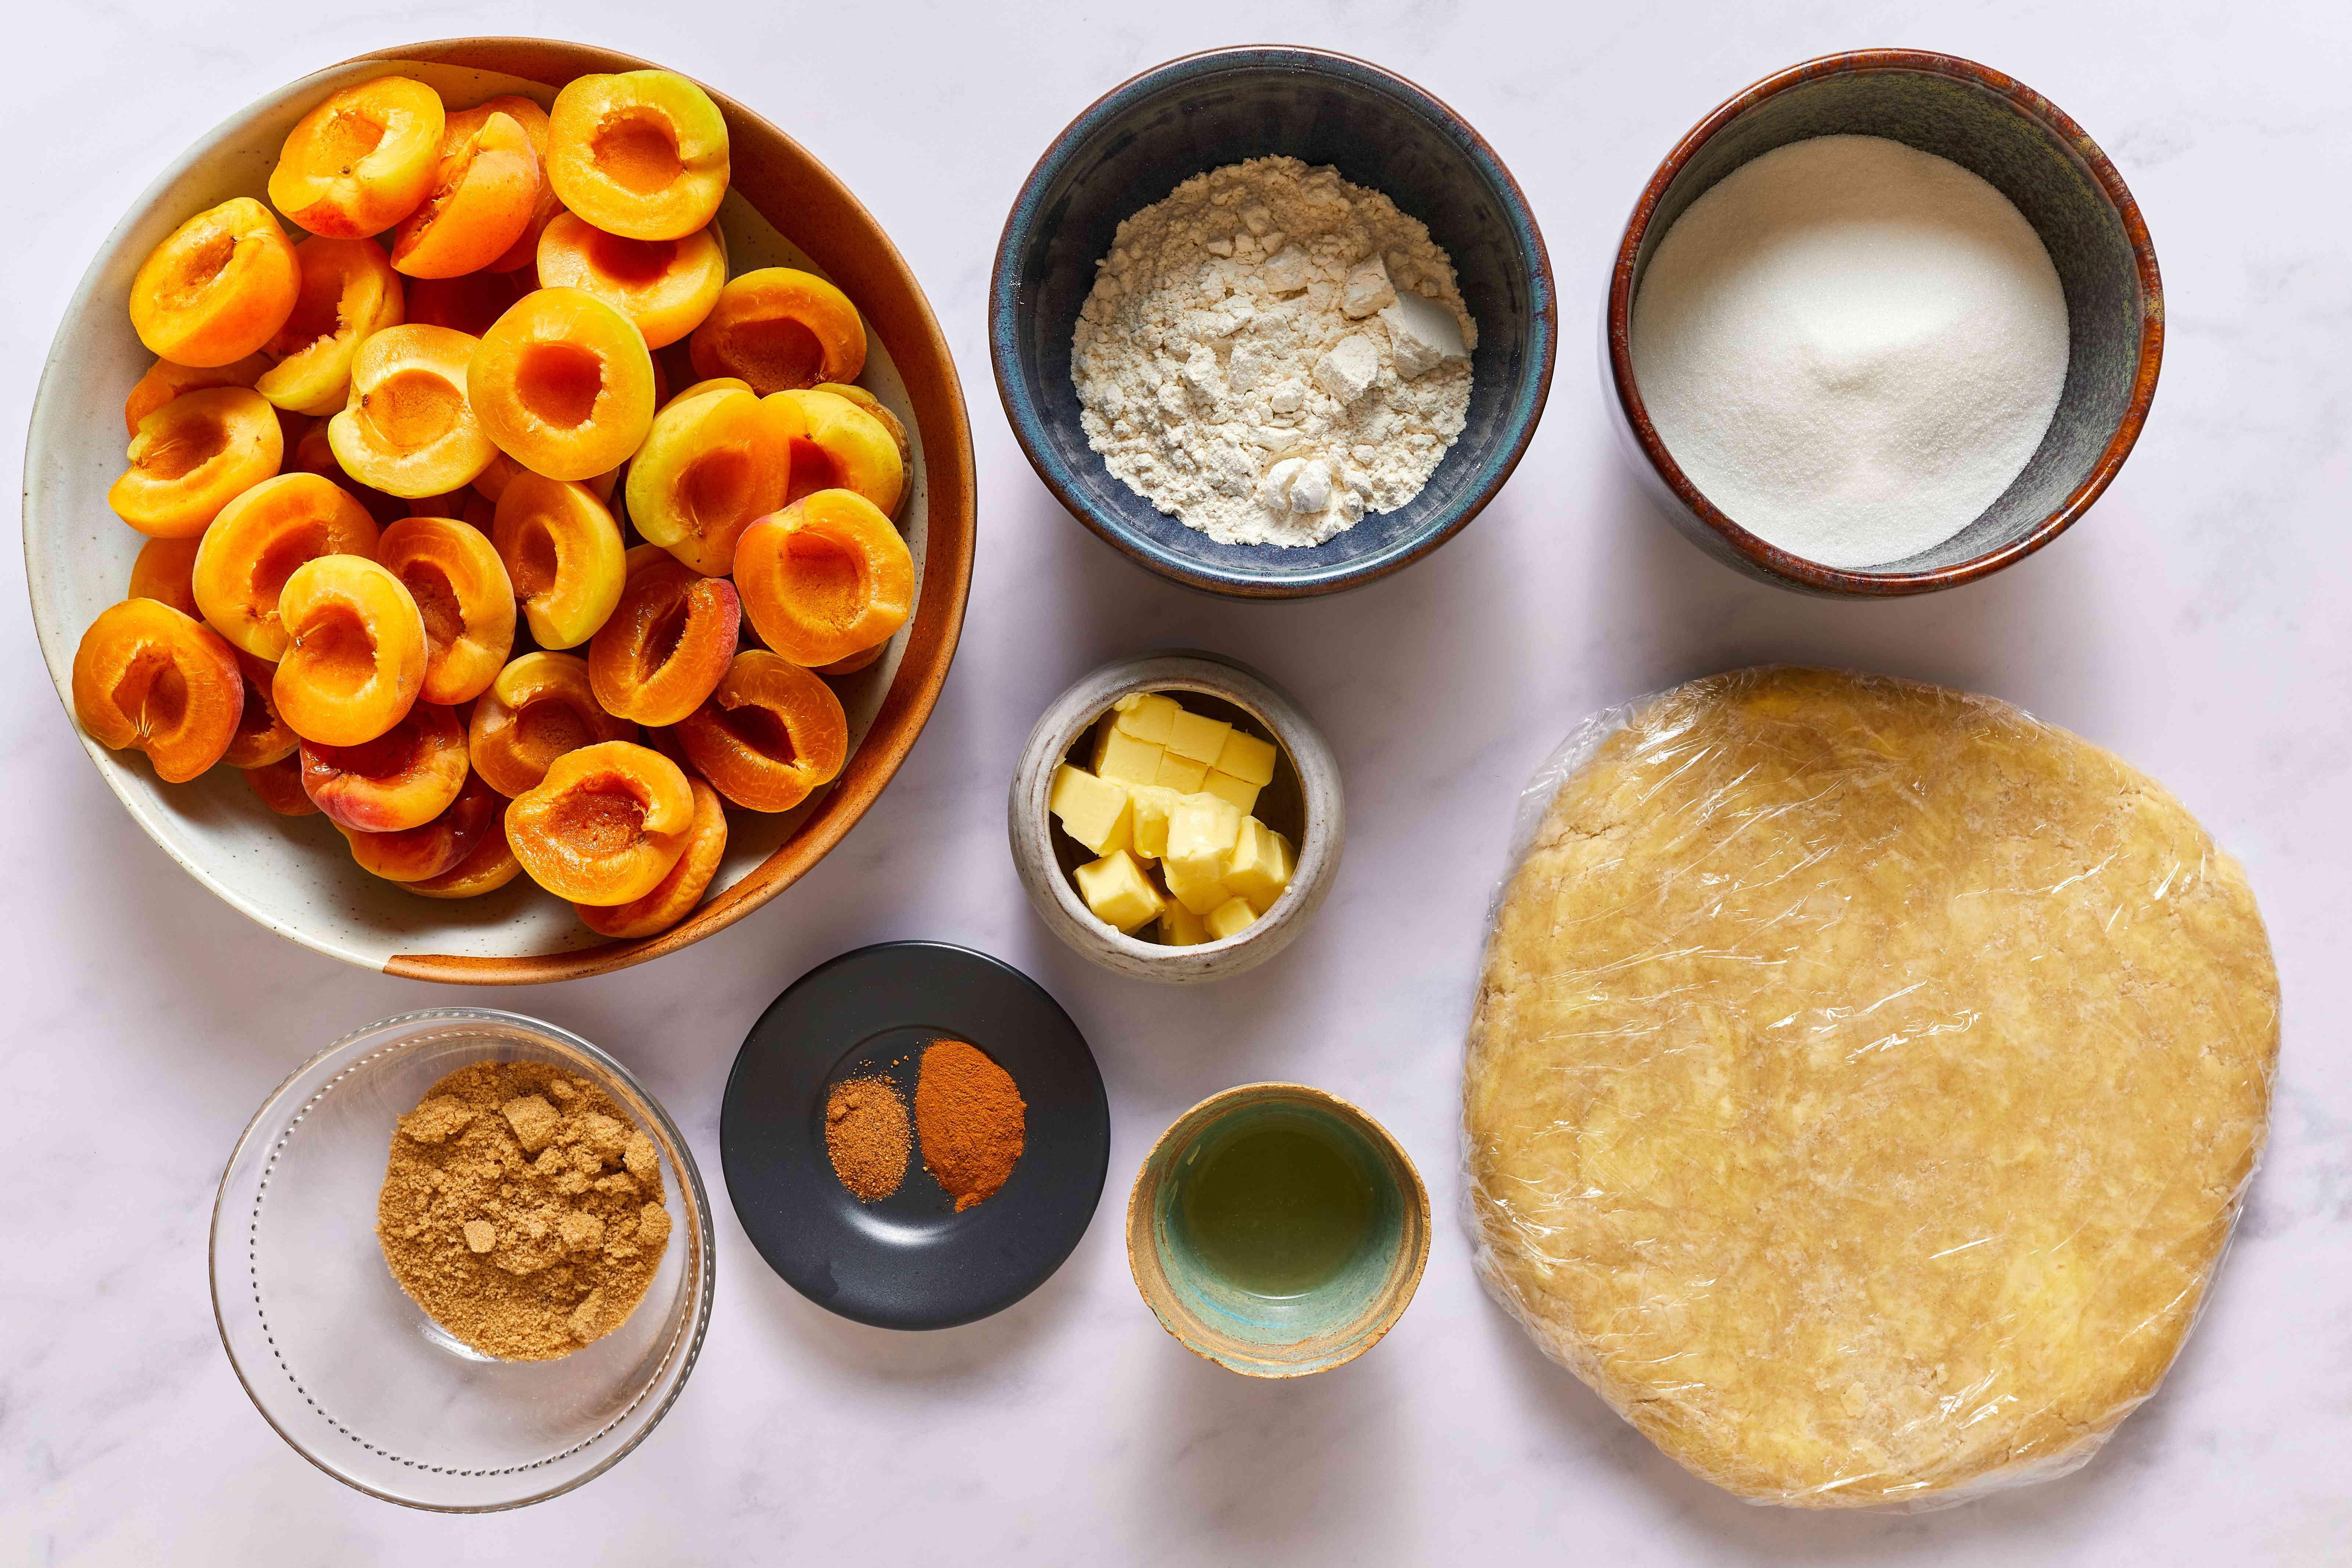 Fresh Apricot Pie ingredients